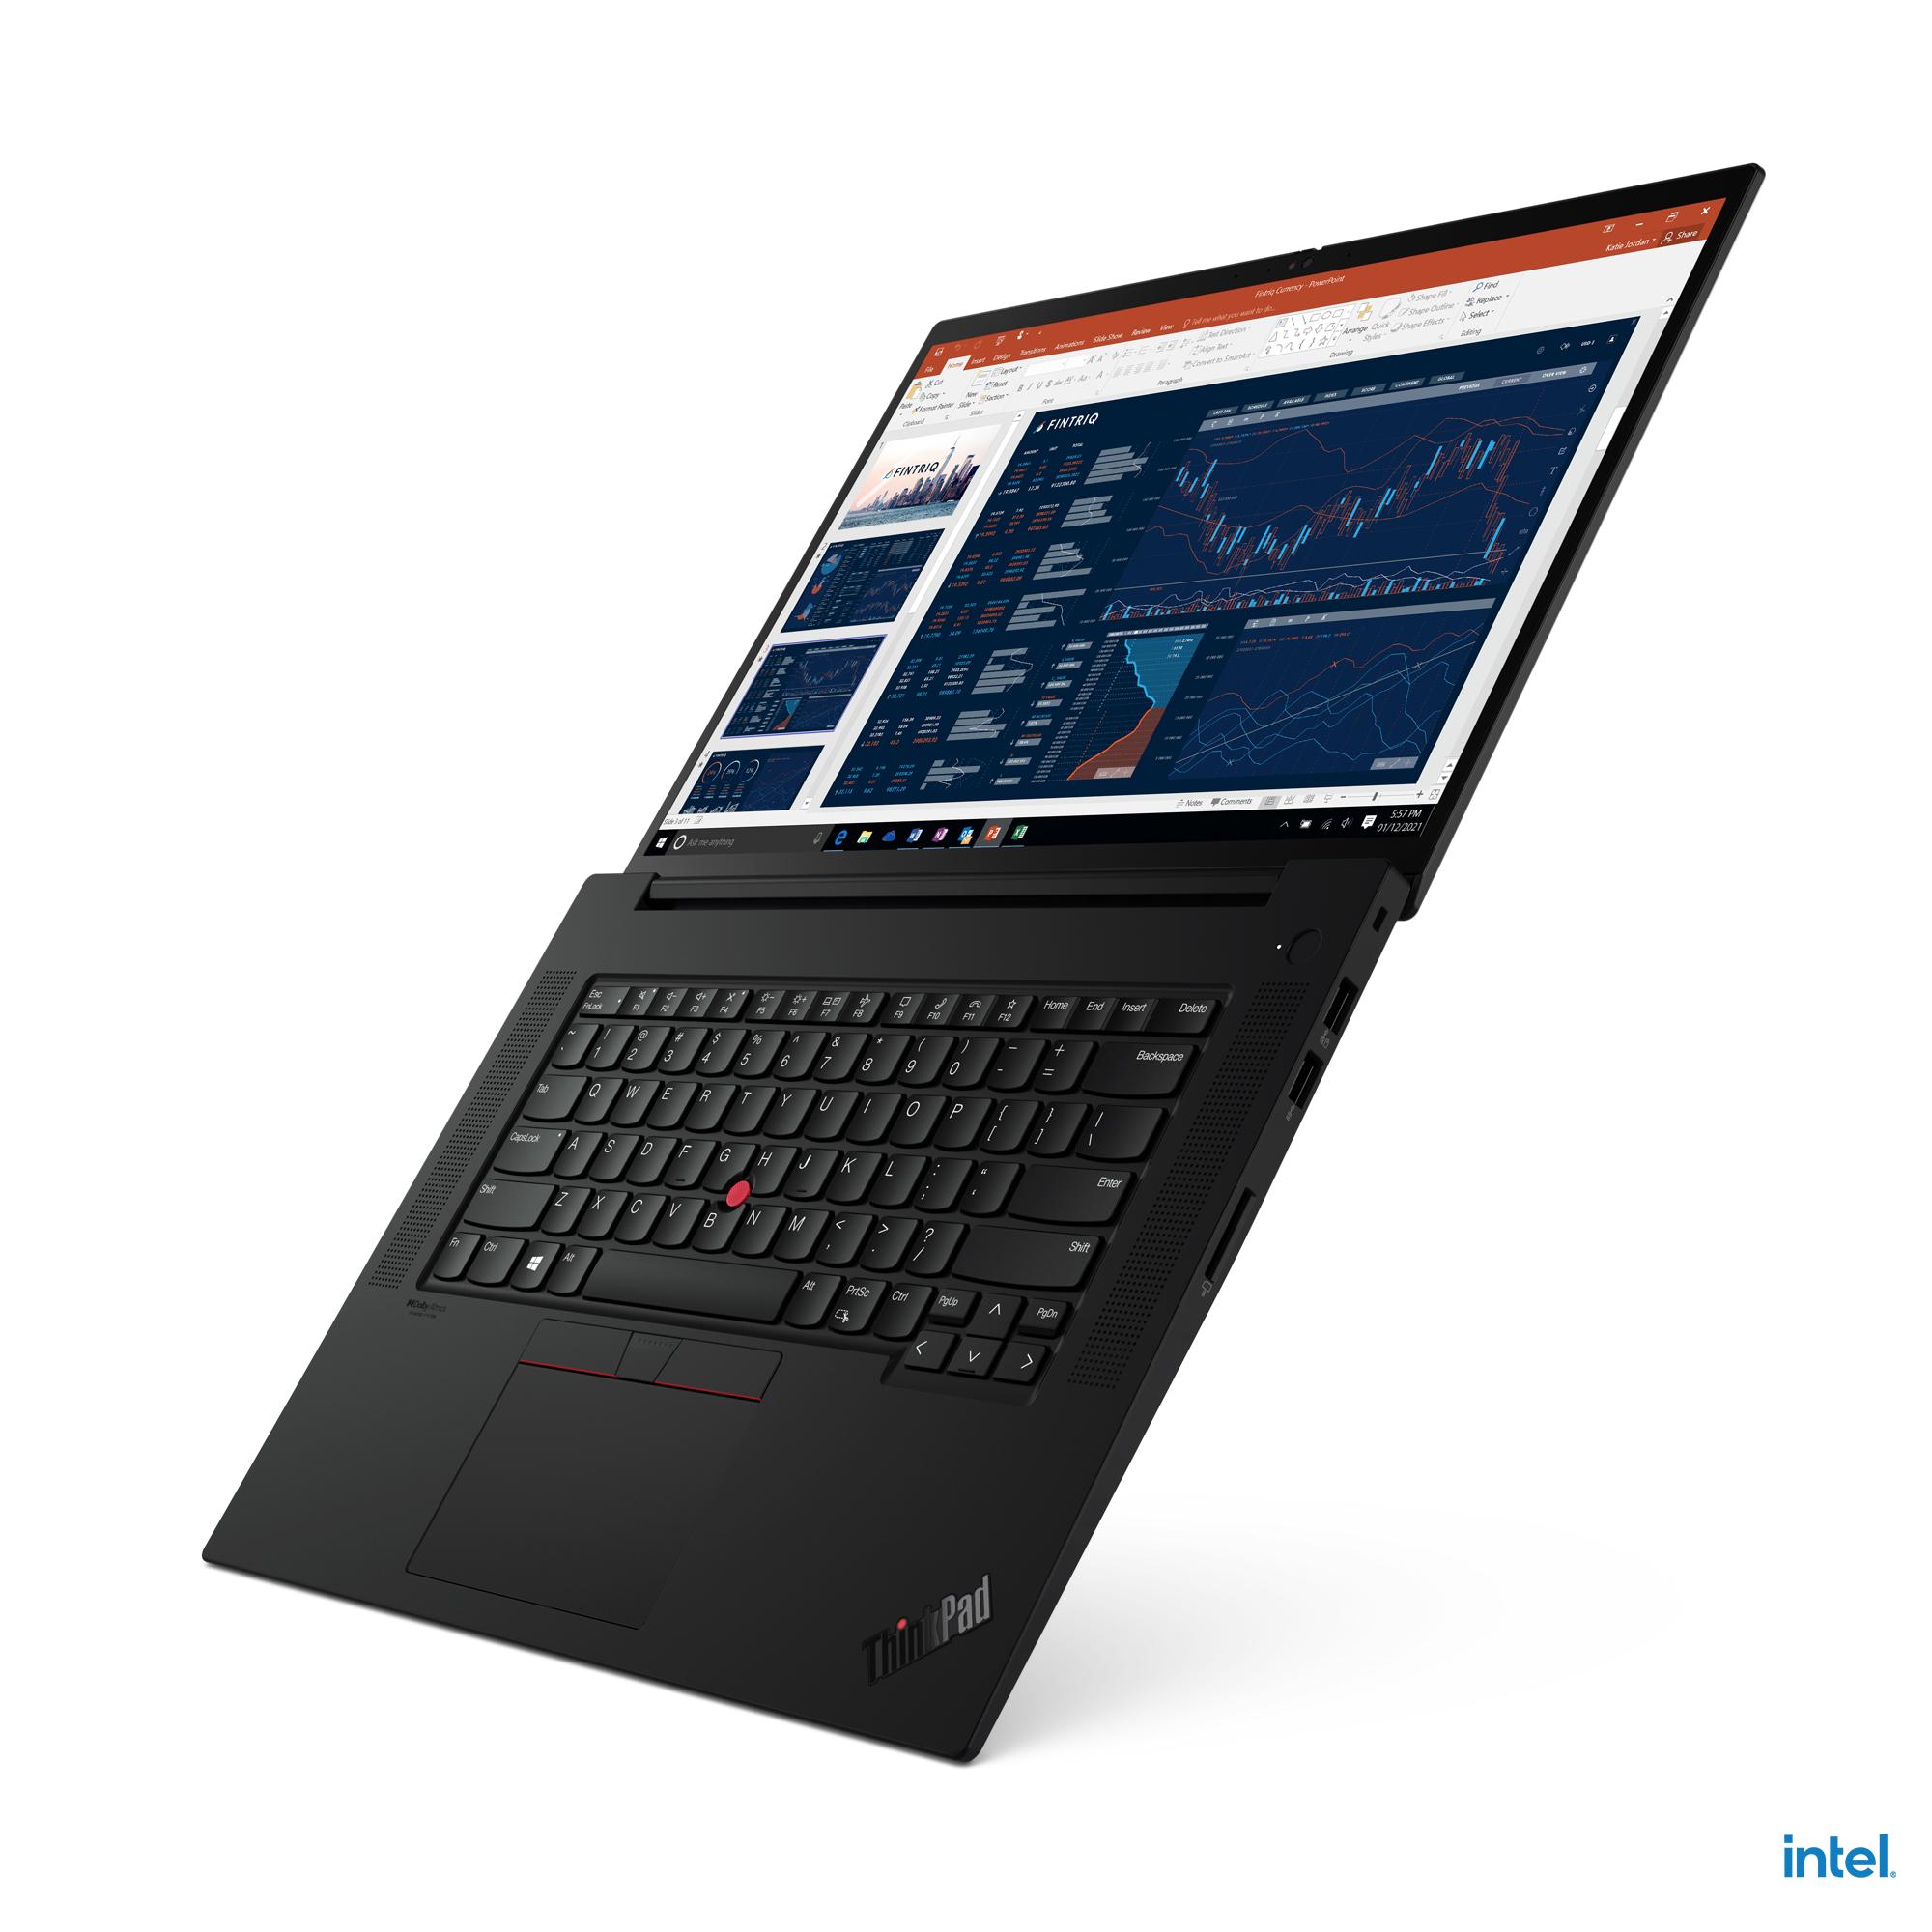 The ThinkPad X1 Extreme fully unfolded.